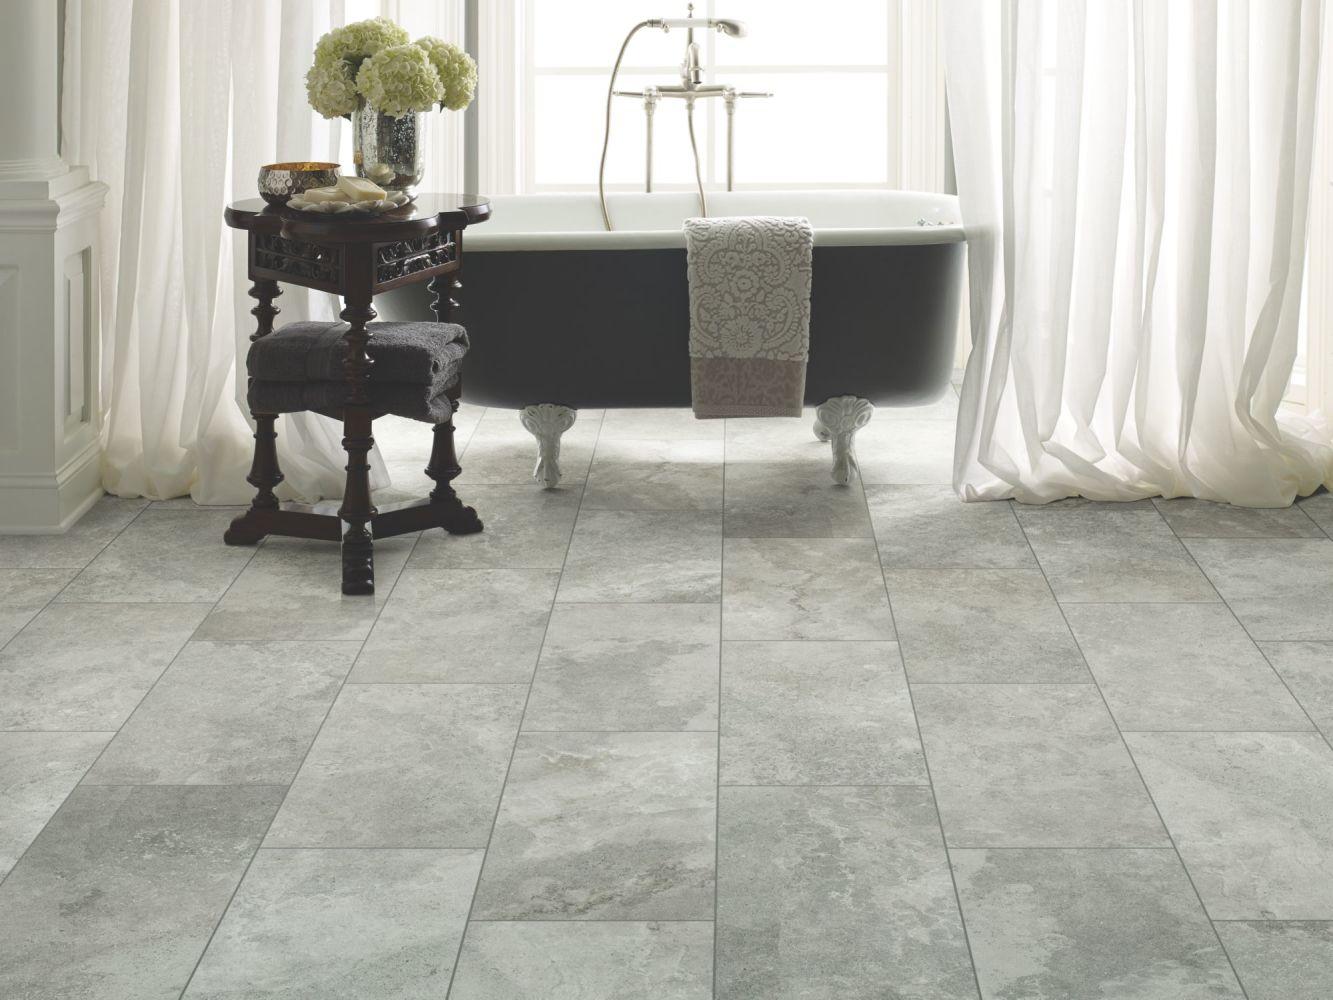 Shaw Floors Home Fn Gold Ceramic Formula 13×13 Evolve 00500_TG93C